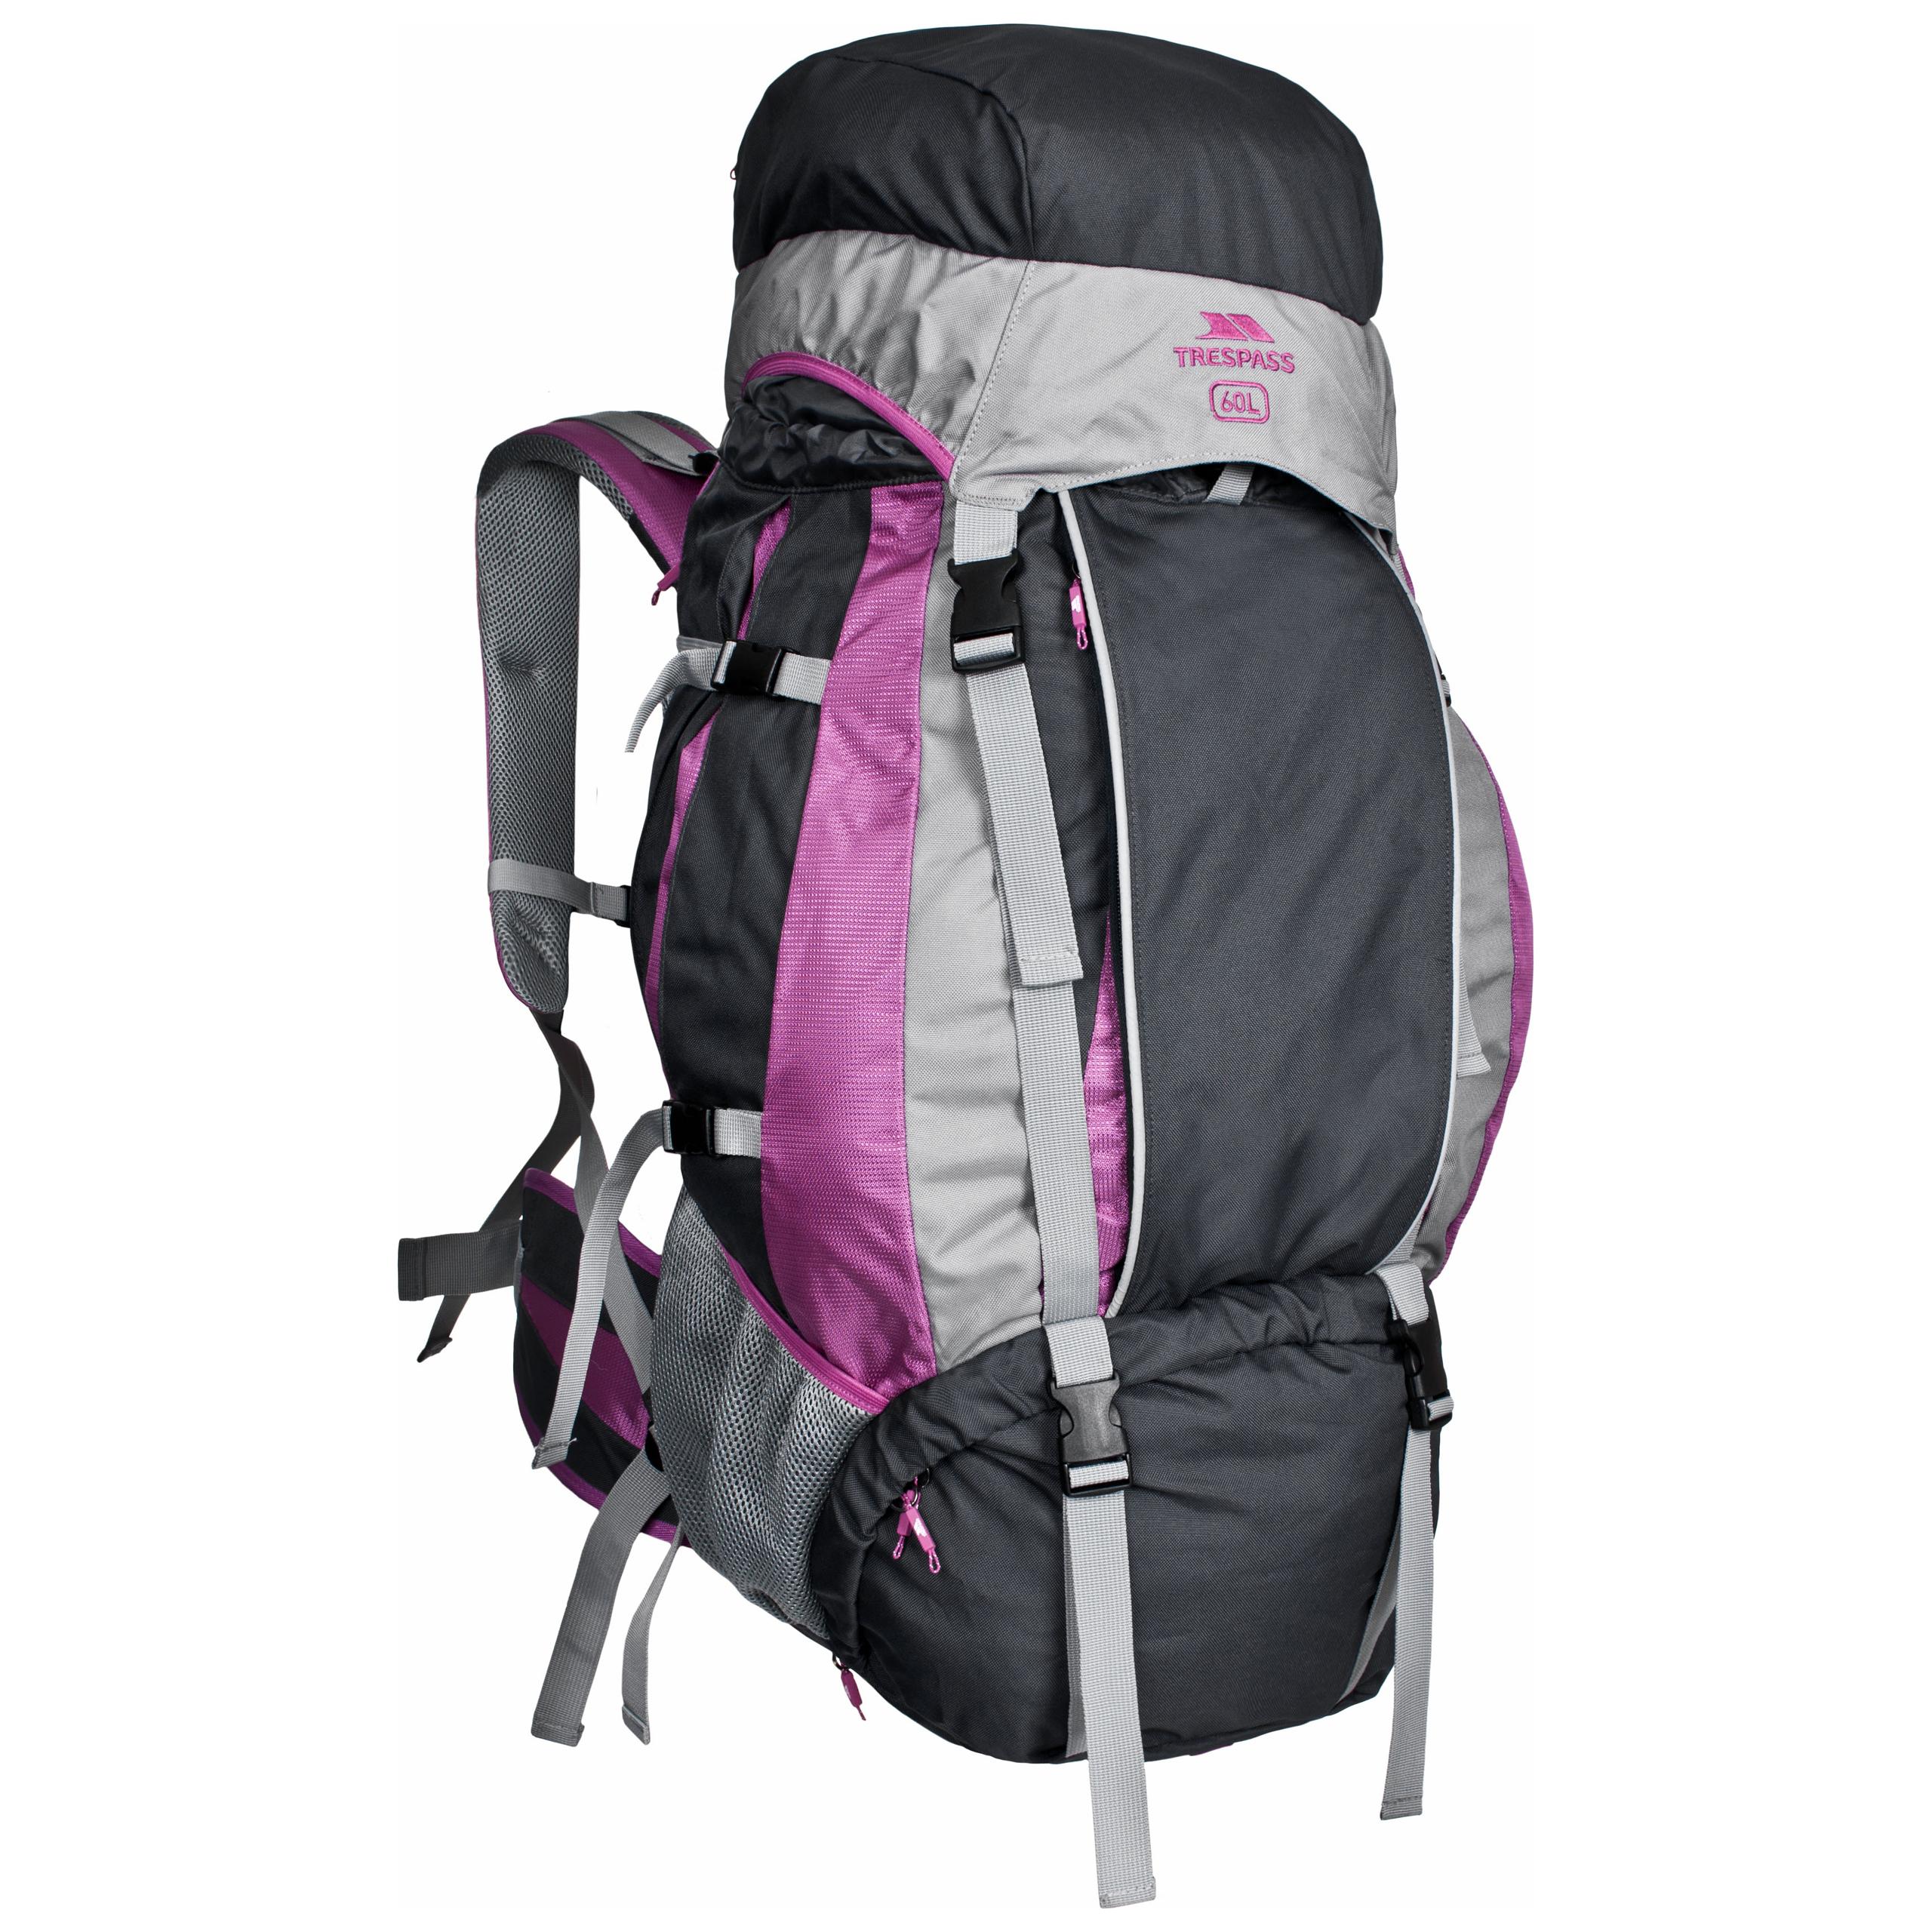 77ea8e4b10 Aria womens 60 litre purple rucksack